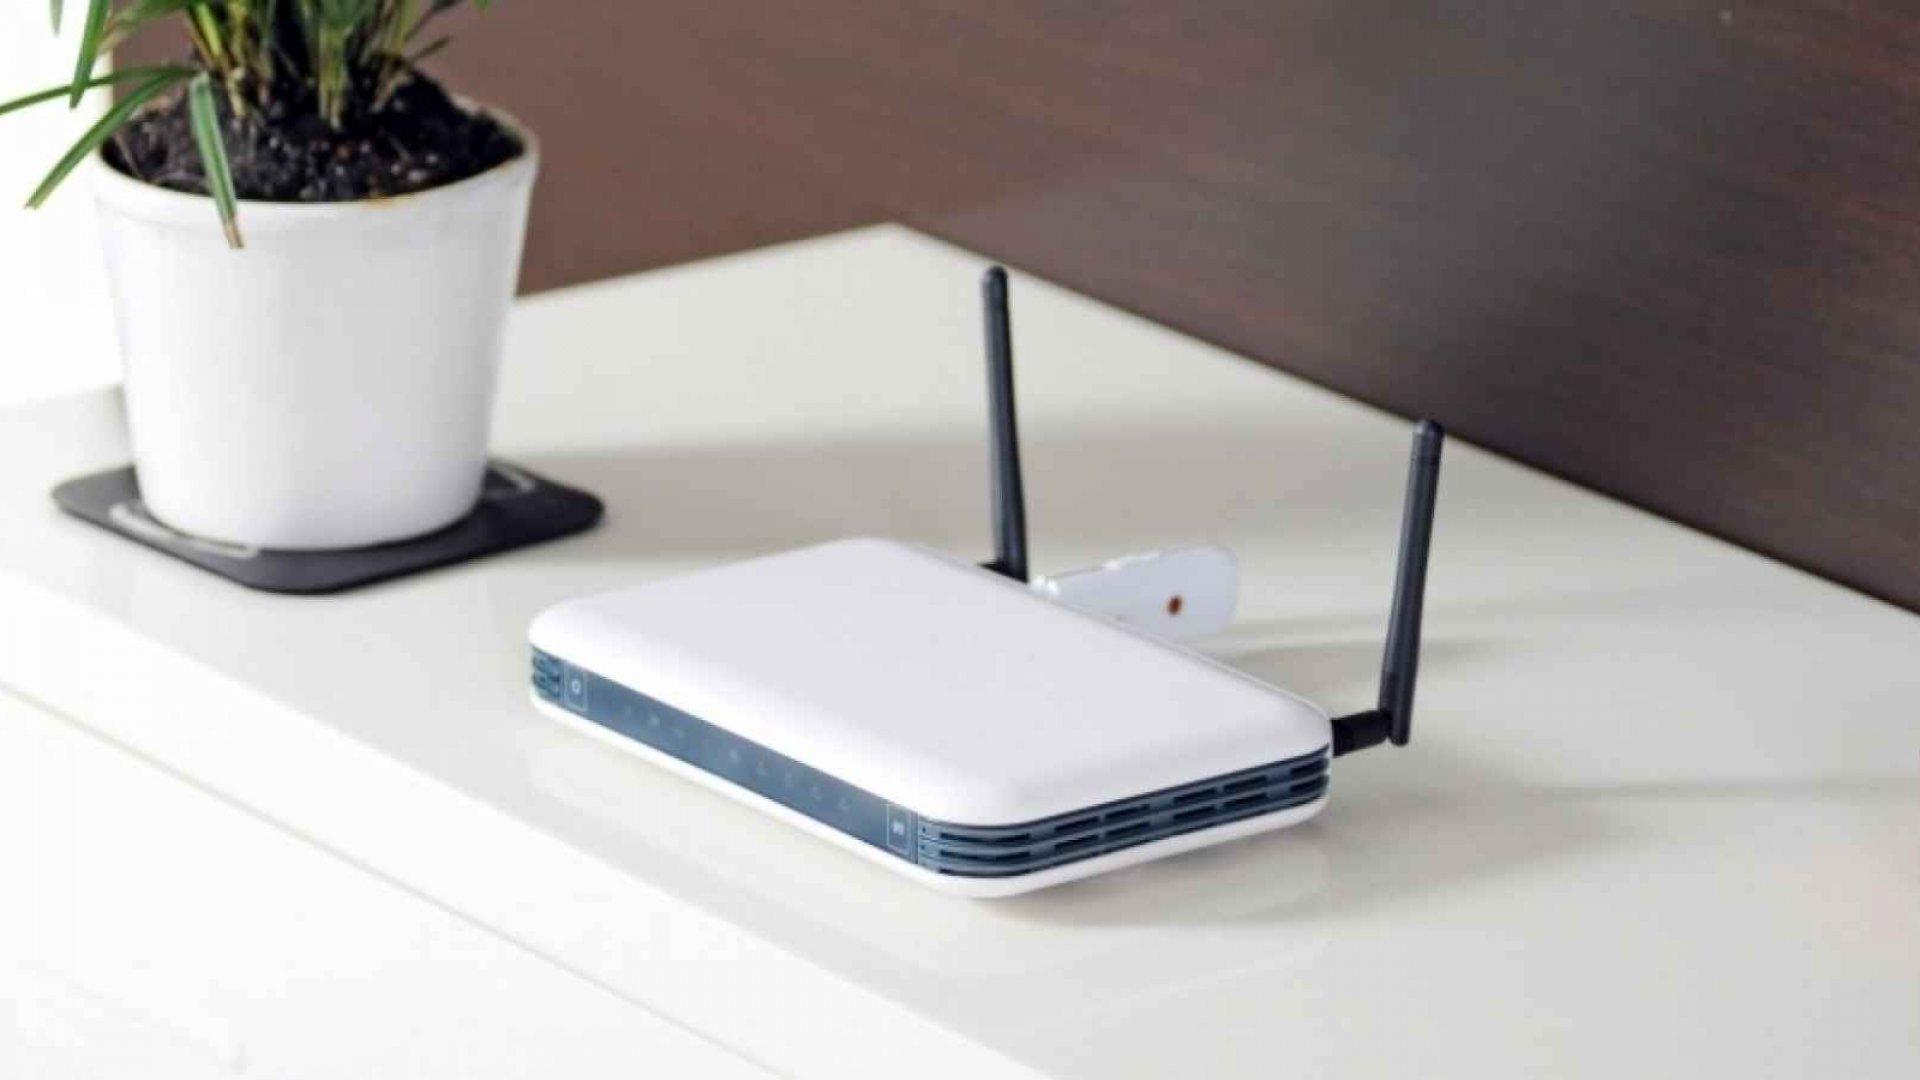 Coming Soon: Nearly Bulletproof Wi-Fi